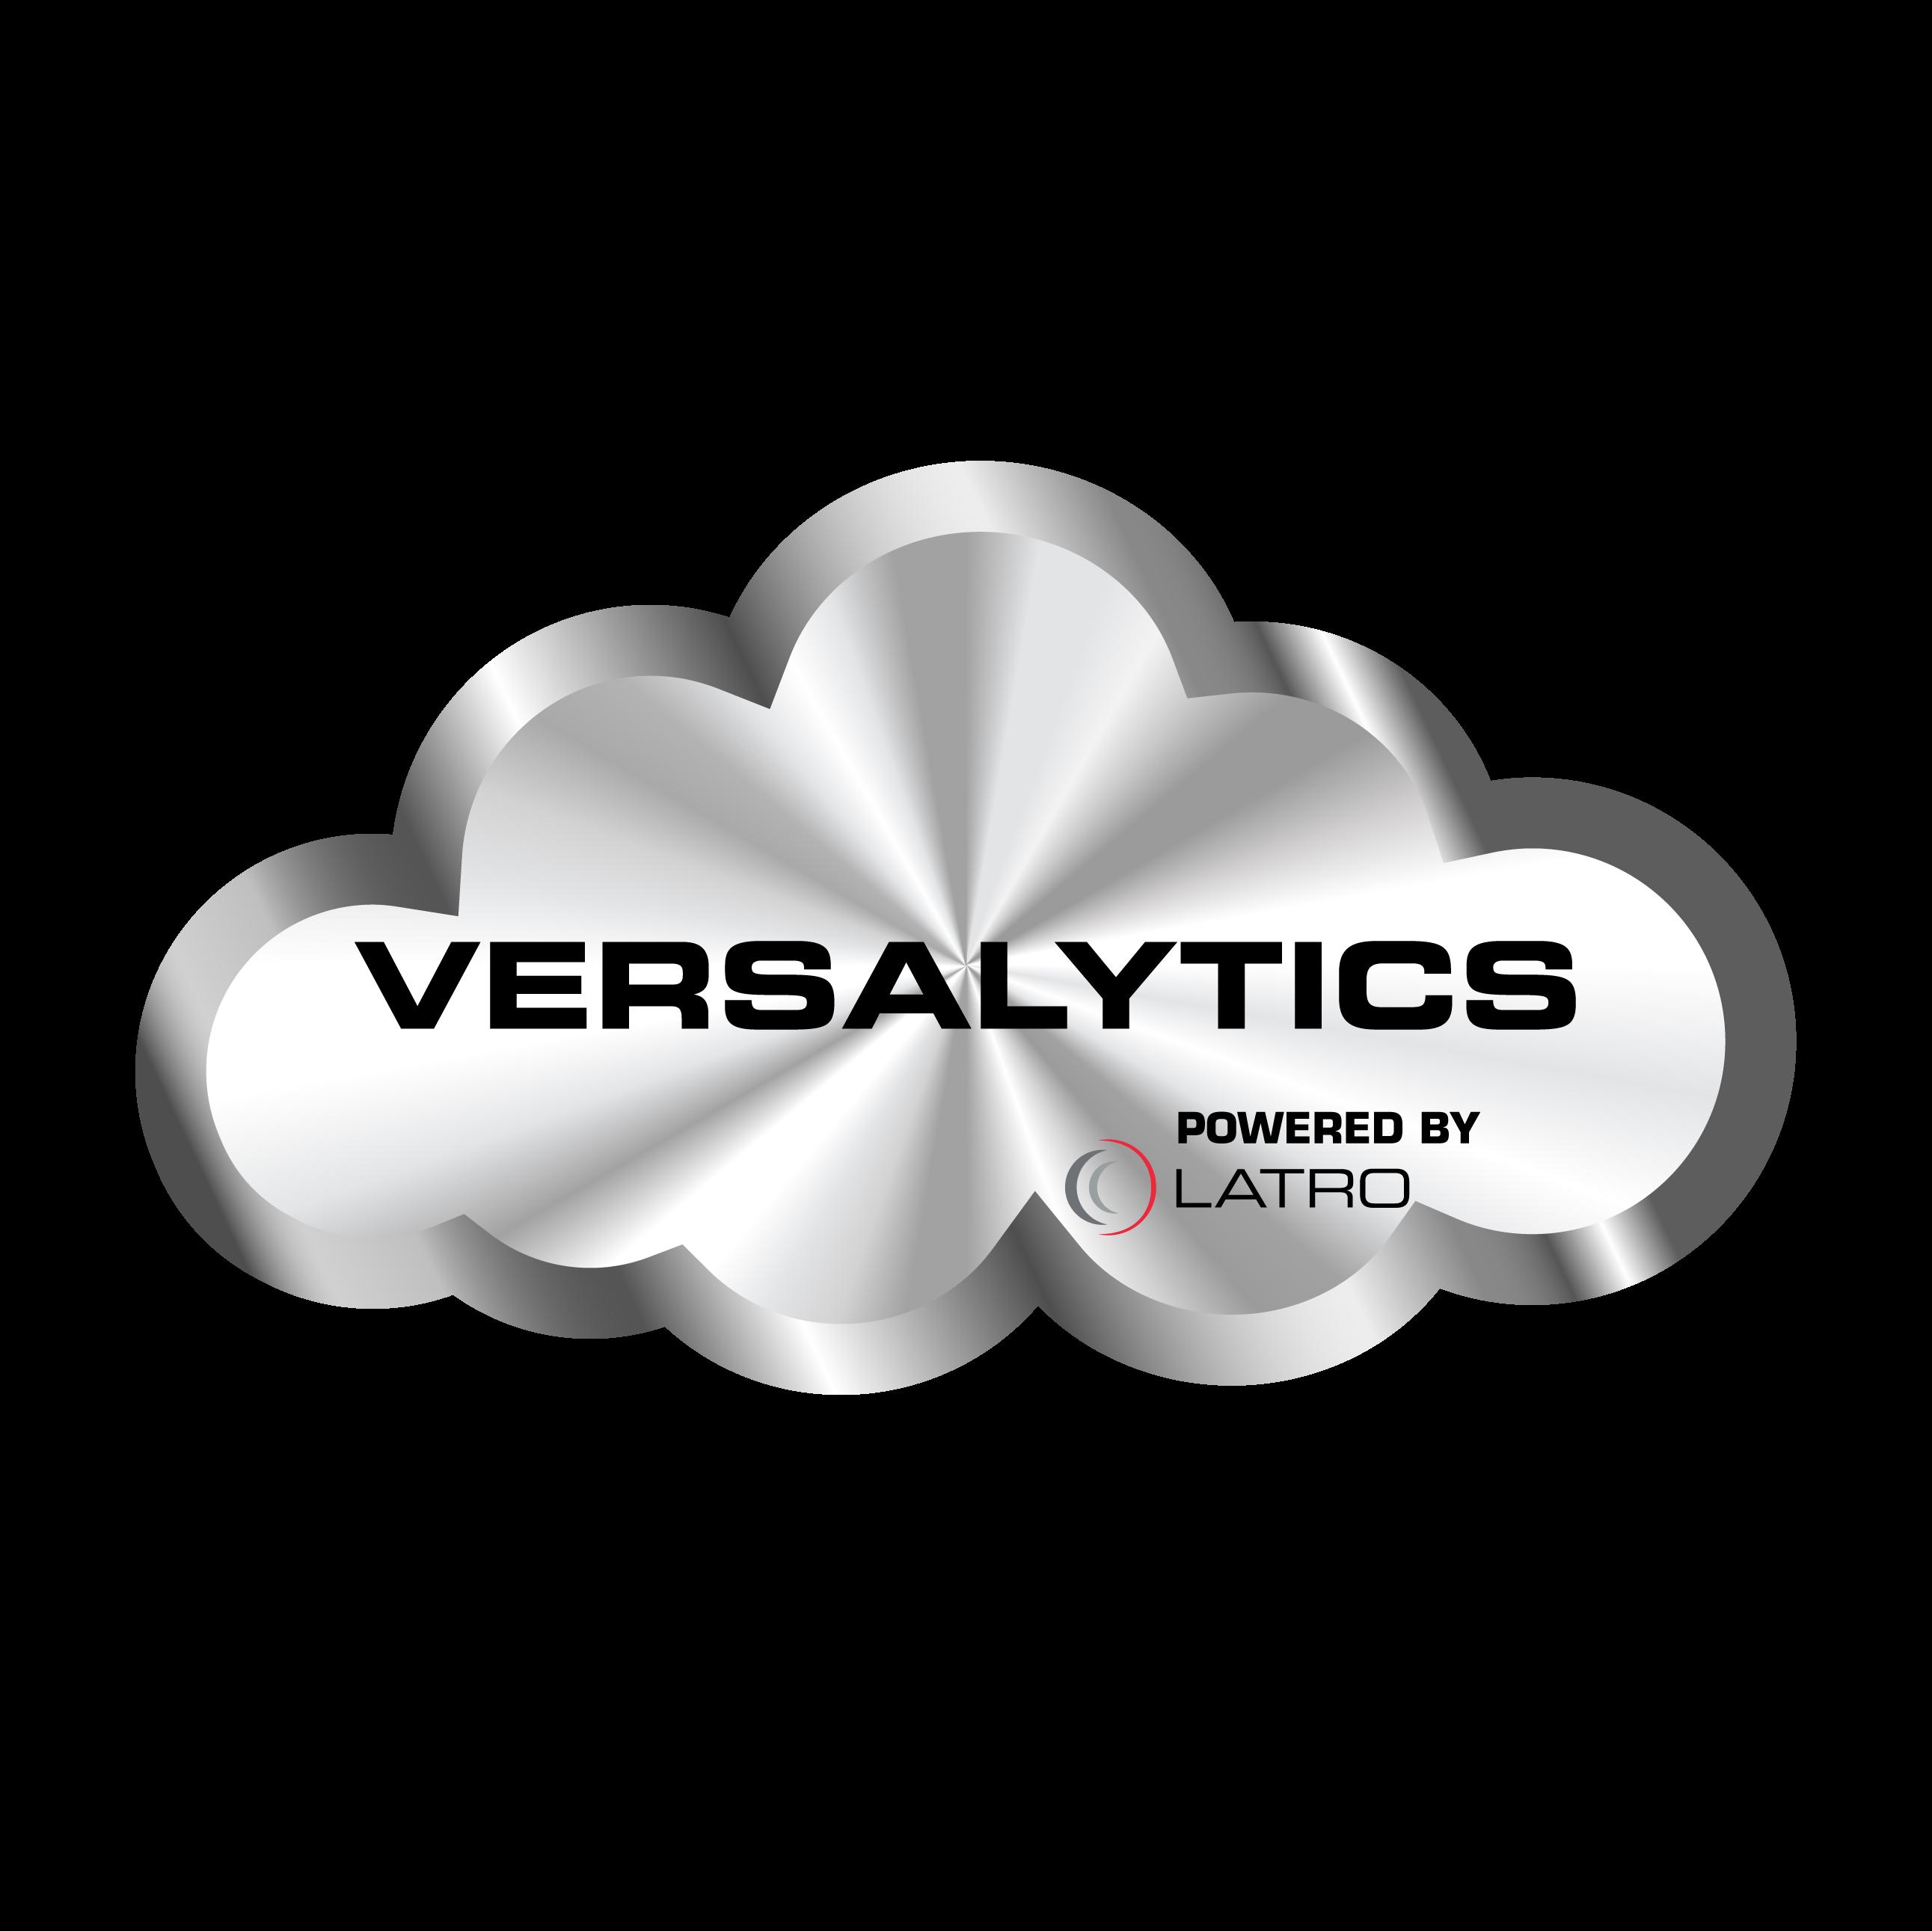 Versalytics for Telecom Fraud Prevention